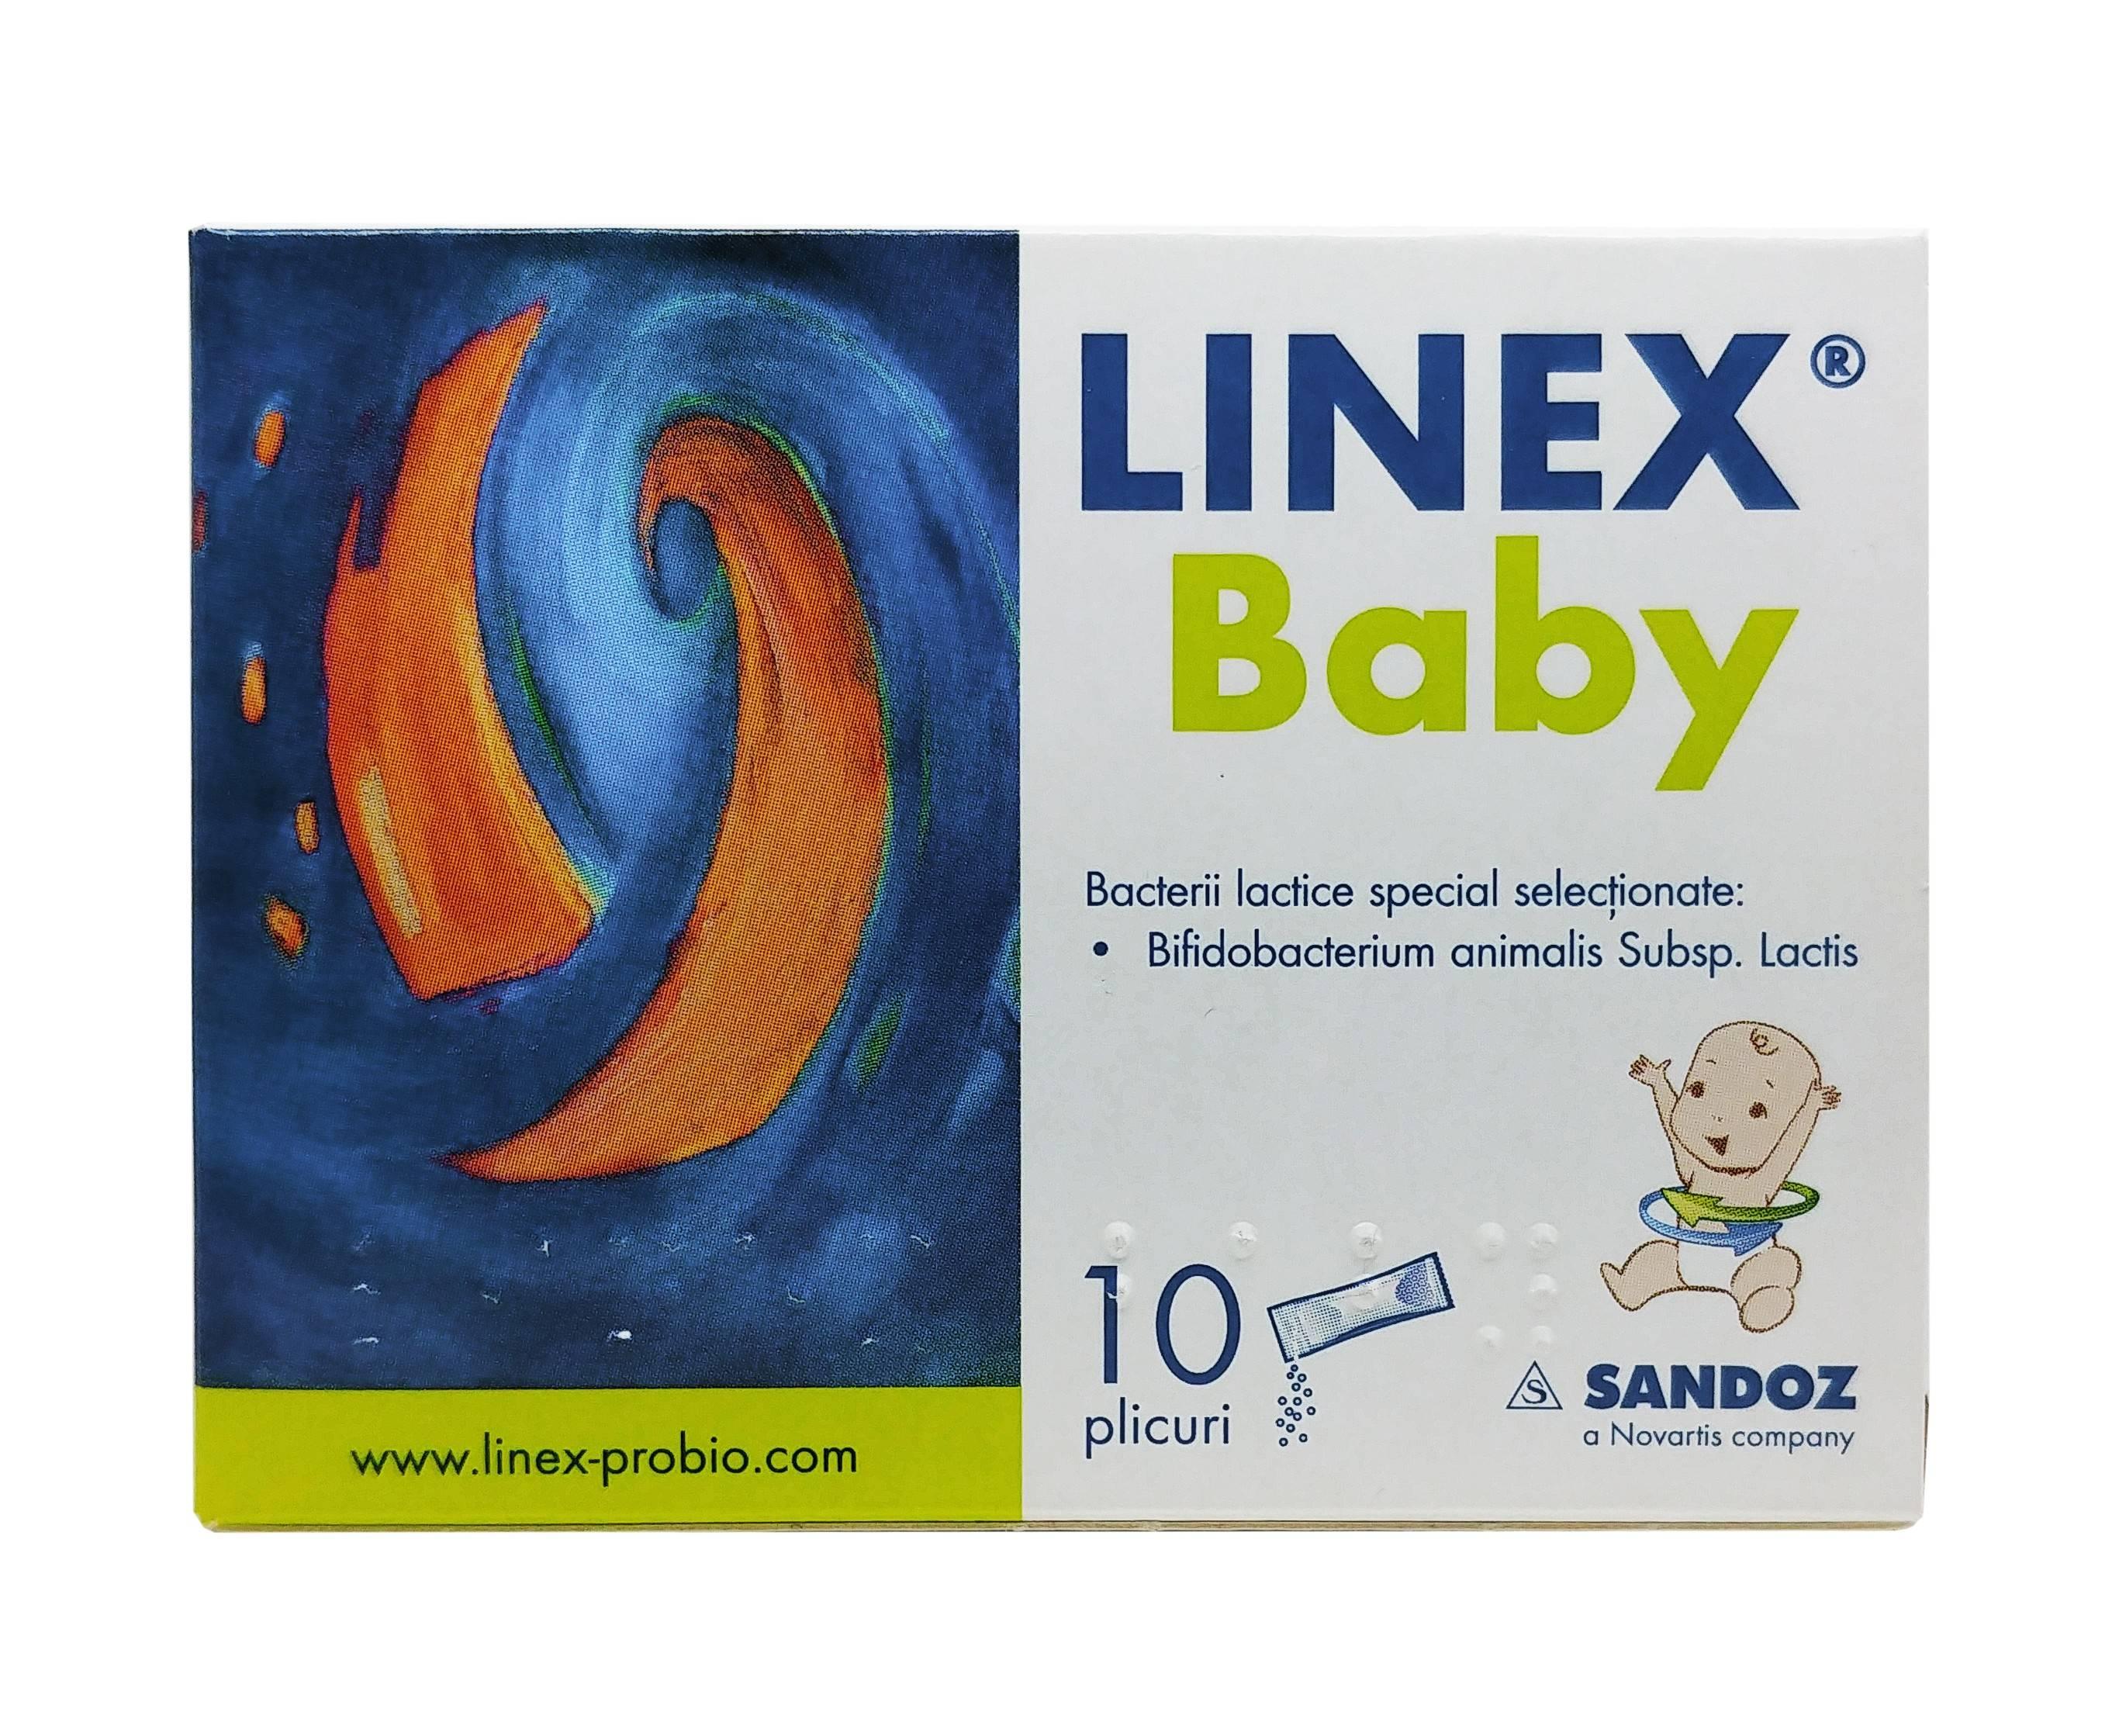 linex baby 10 plicuri